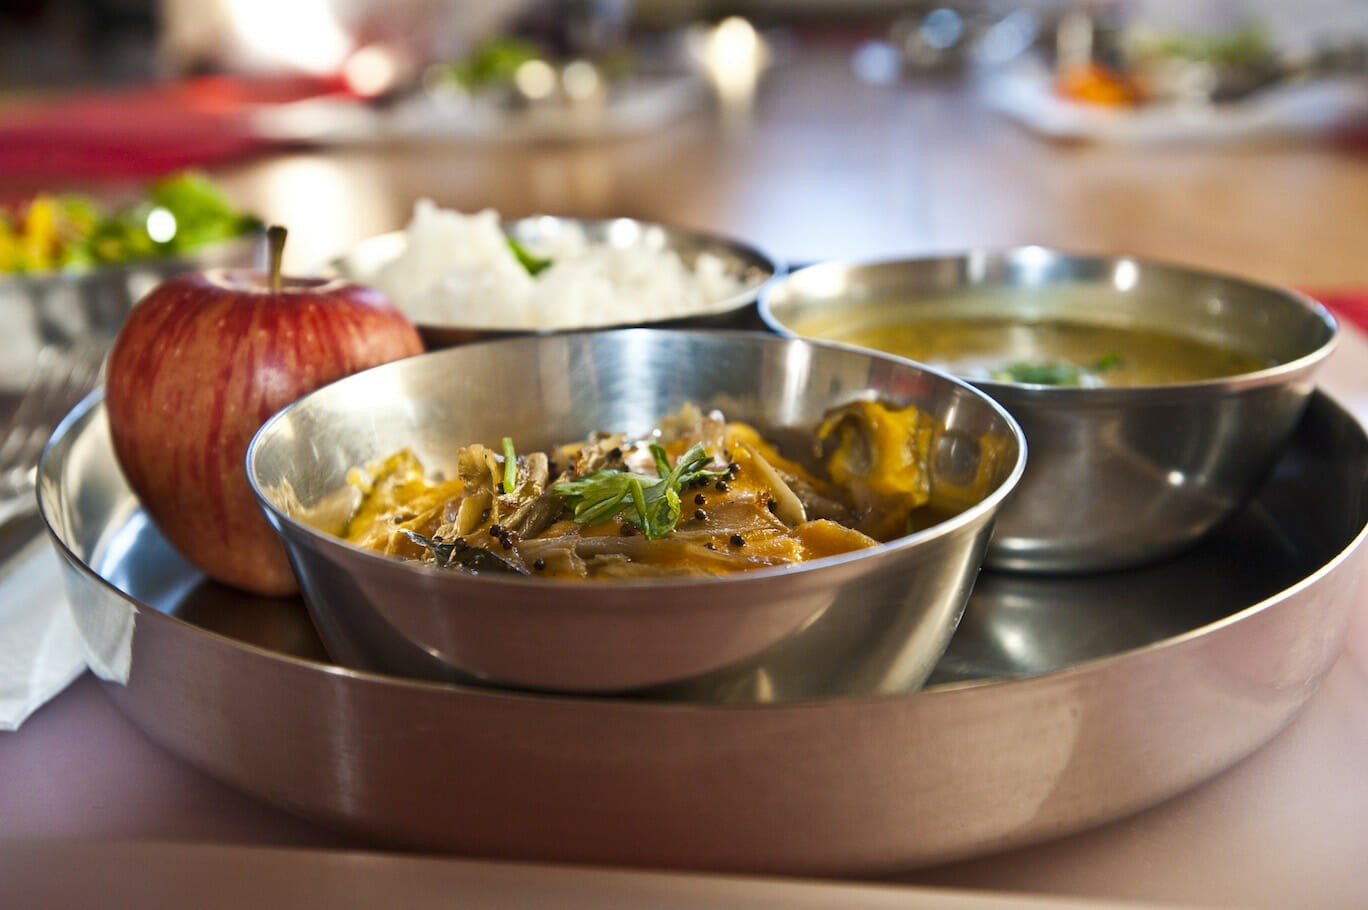 Delicious Vegetarian Meals | Ashram de Yoga Sivananda | Yoga | France